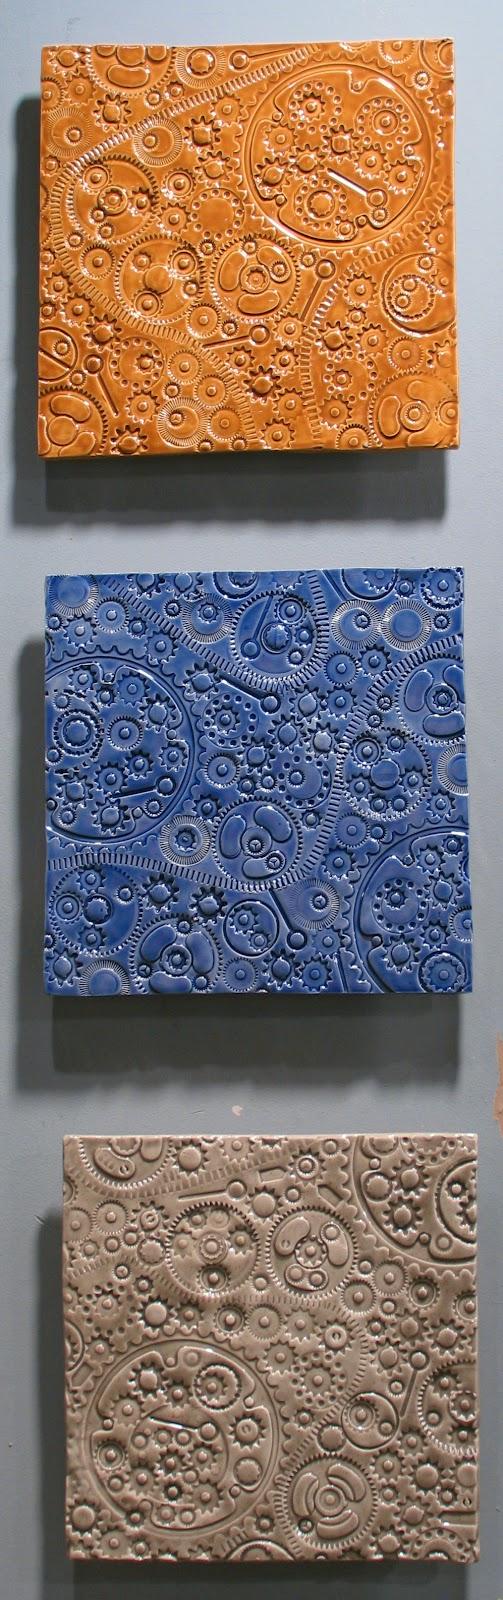 Ceramic tile gear embossed wall art mural by jasonmessingerart ceramic tile gear embossed wall art mural by jasonmessingerart amipublicfo Gallery